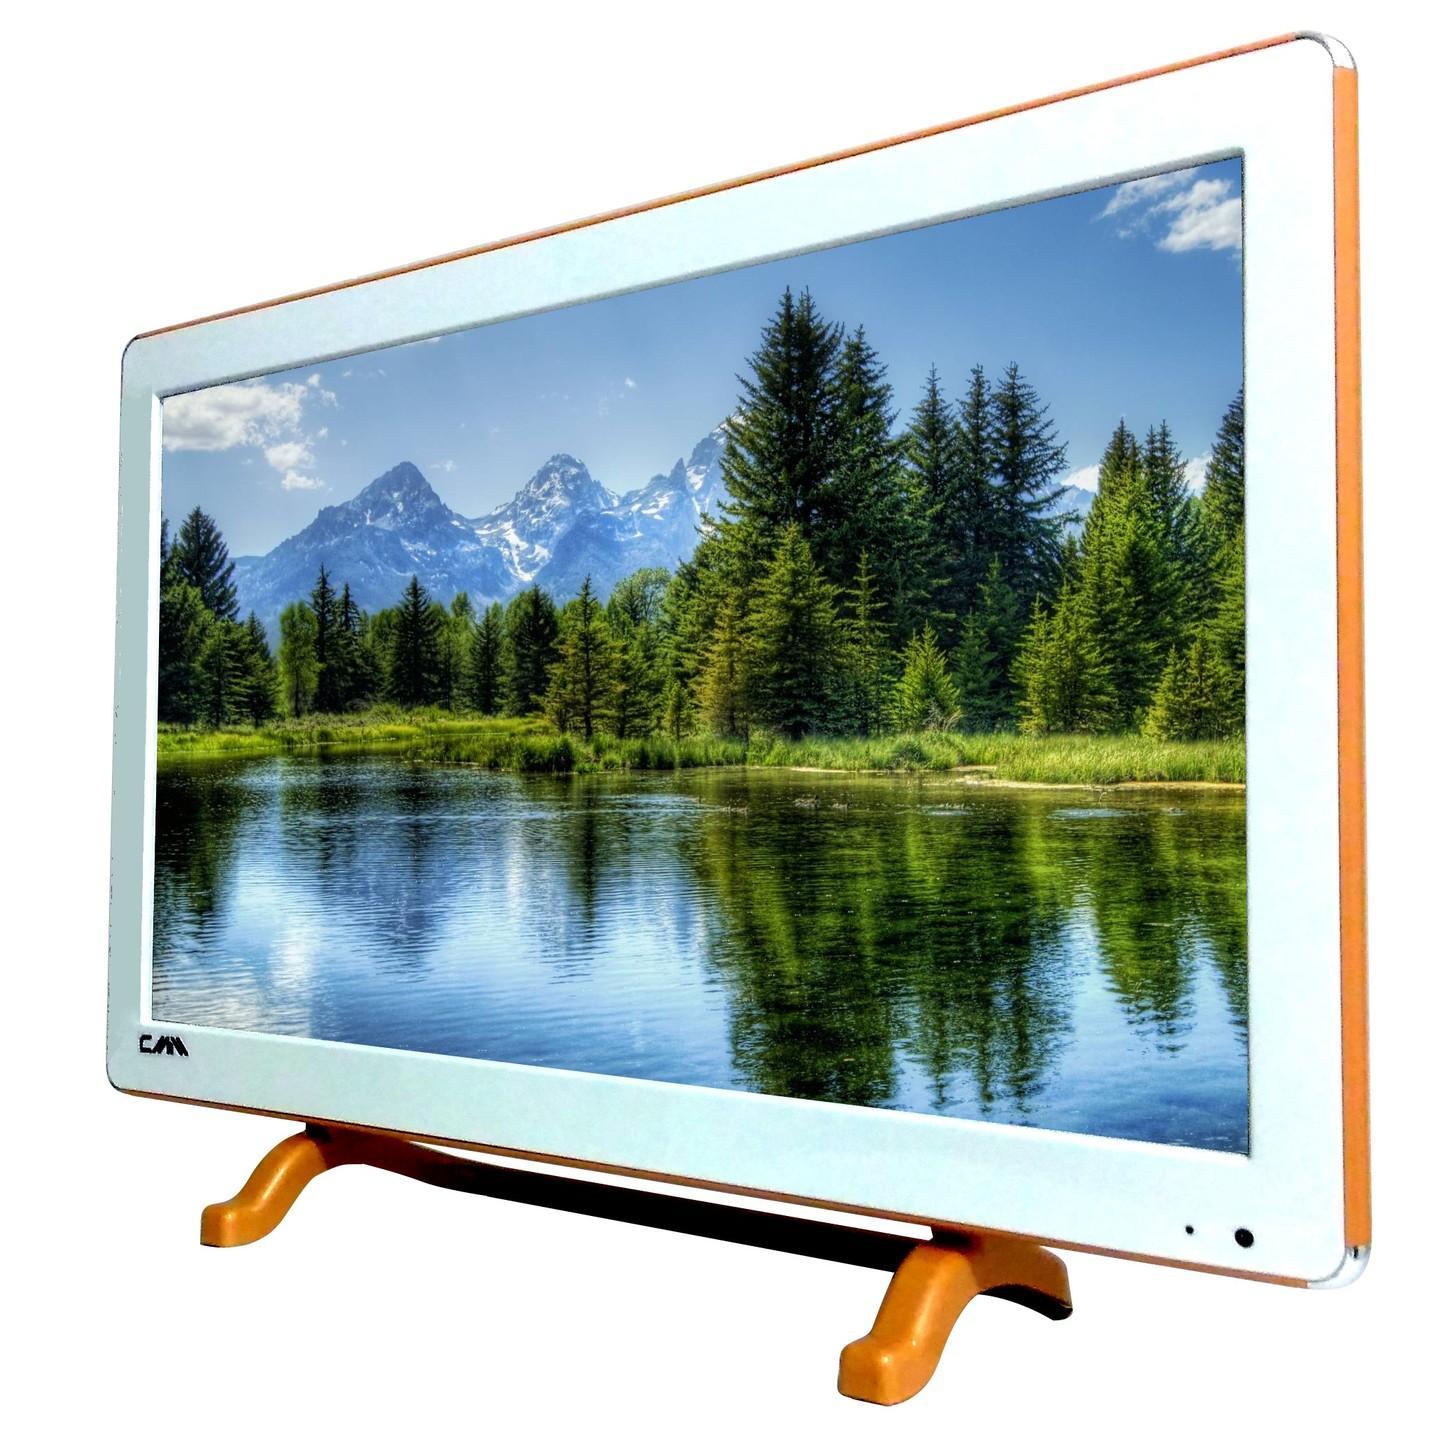 TV LED CMM 21 inch Wide / USB Movie Ready / Putih / Fitur Lengkap / Murah